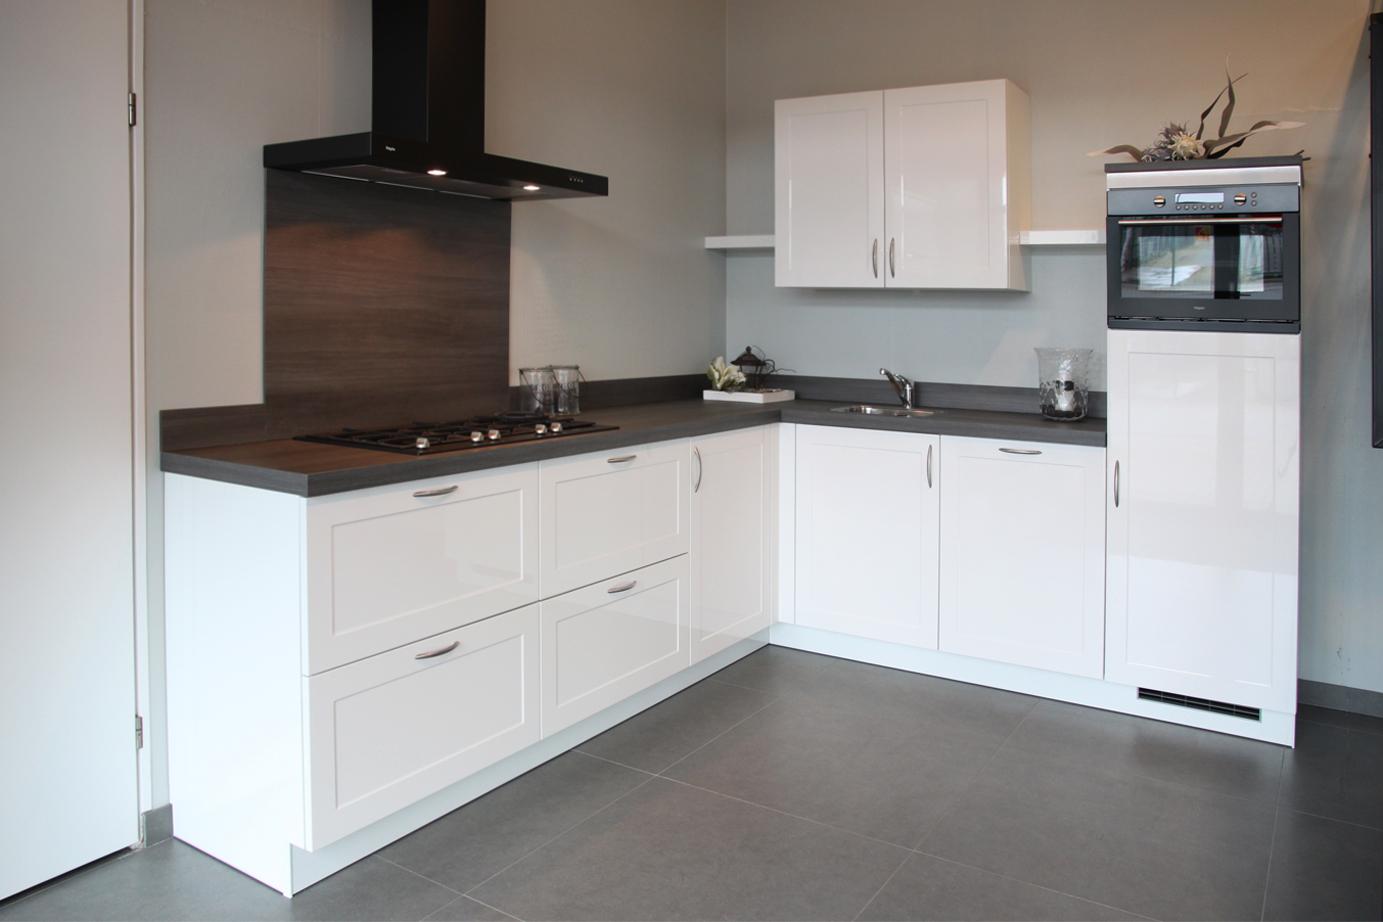 Design Witte Keuken : Witte keuken